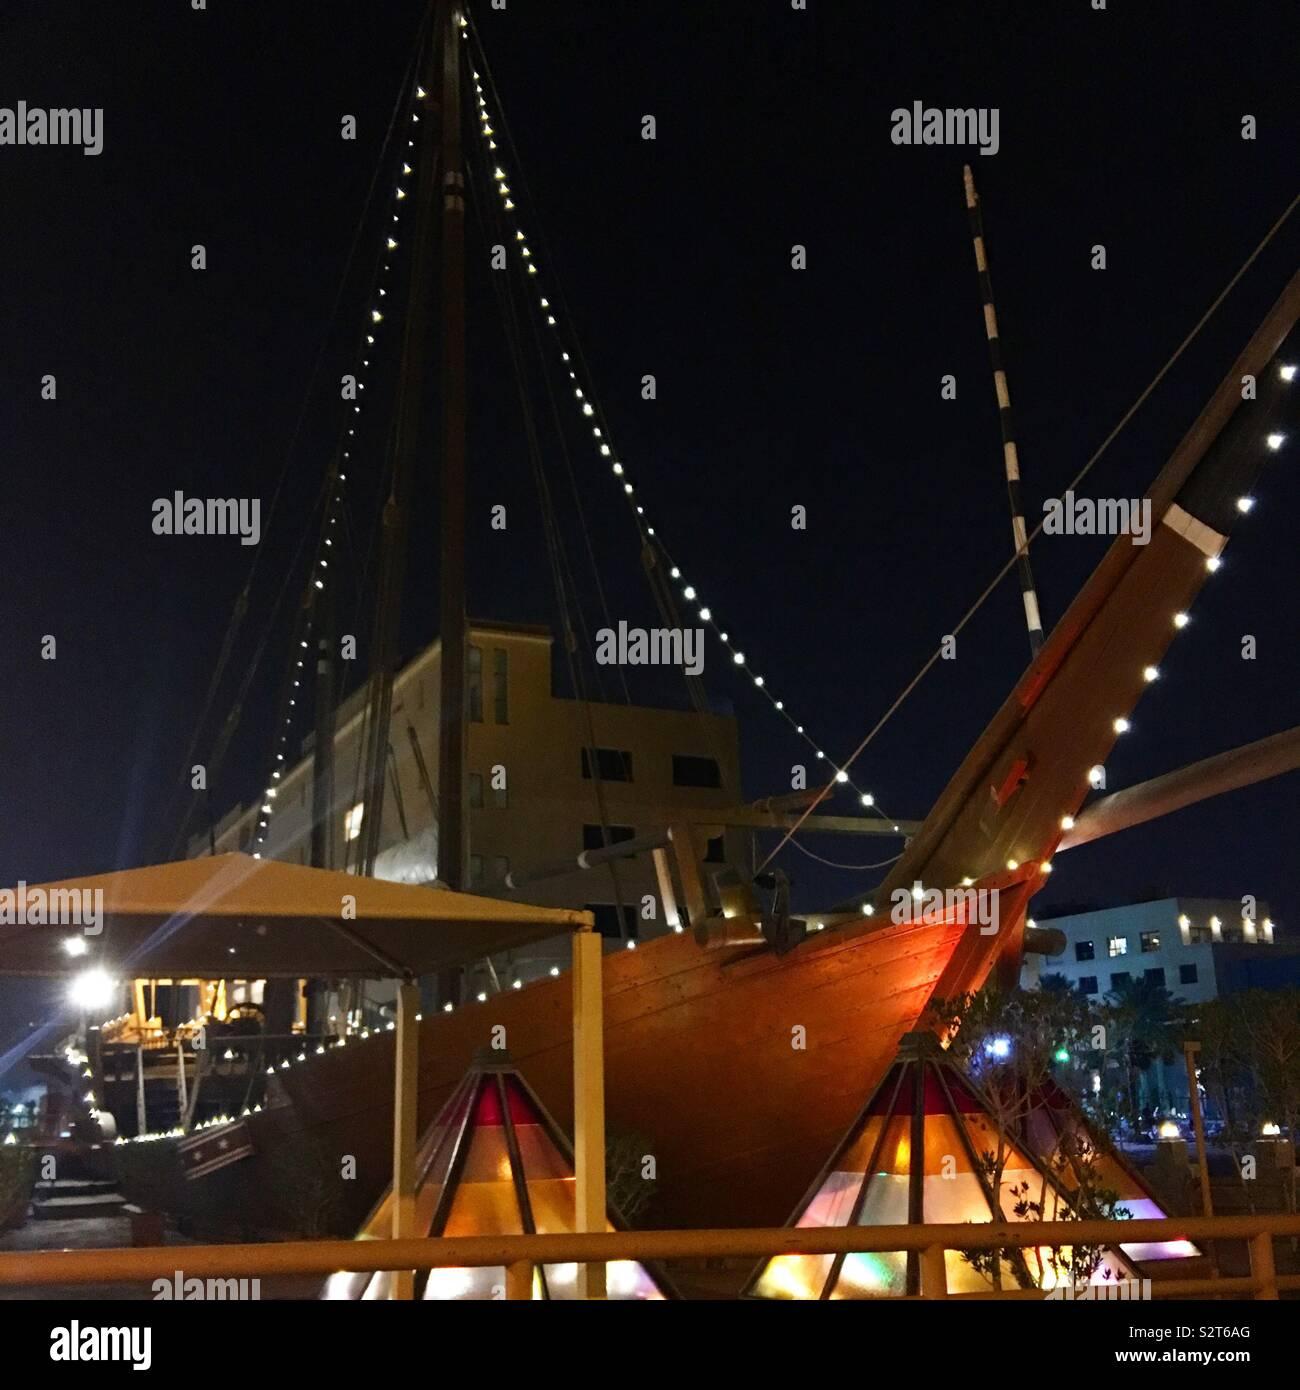 Boat life - Stock Image